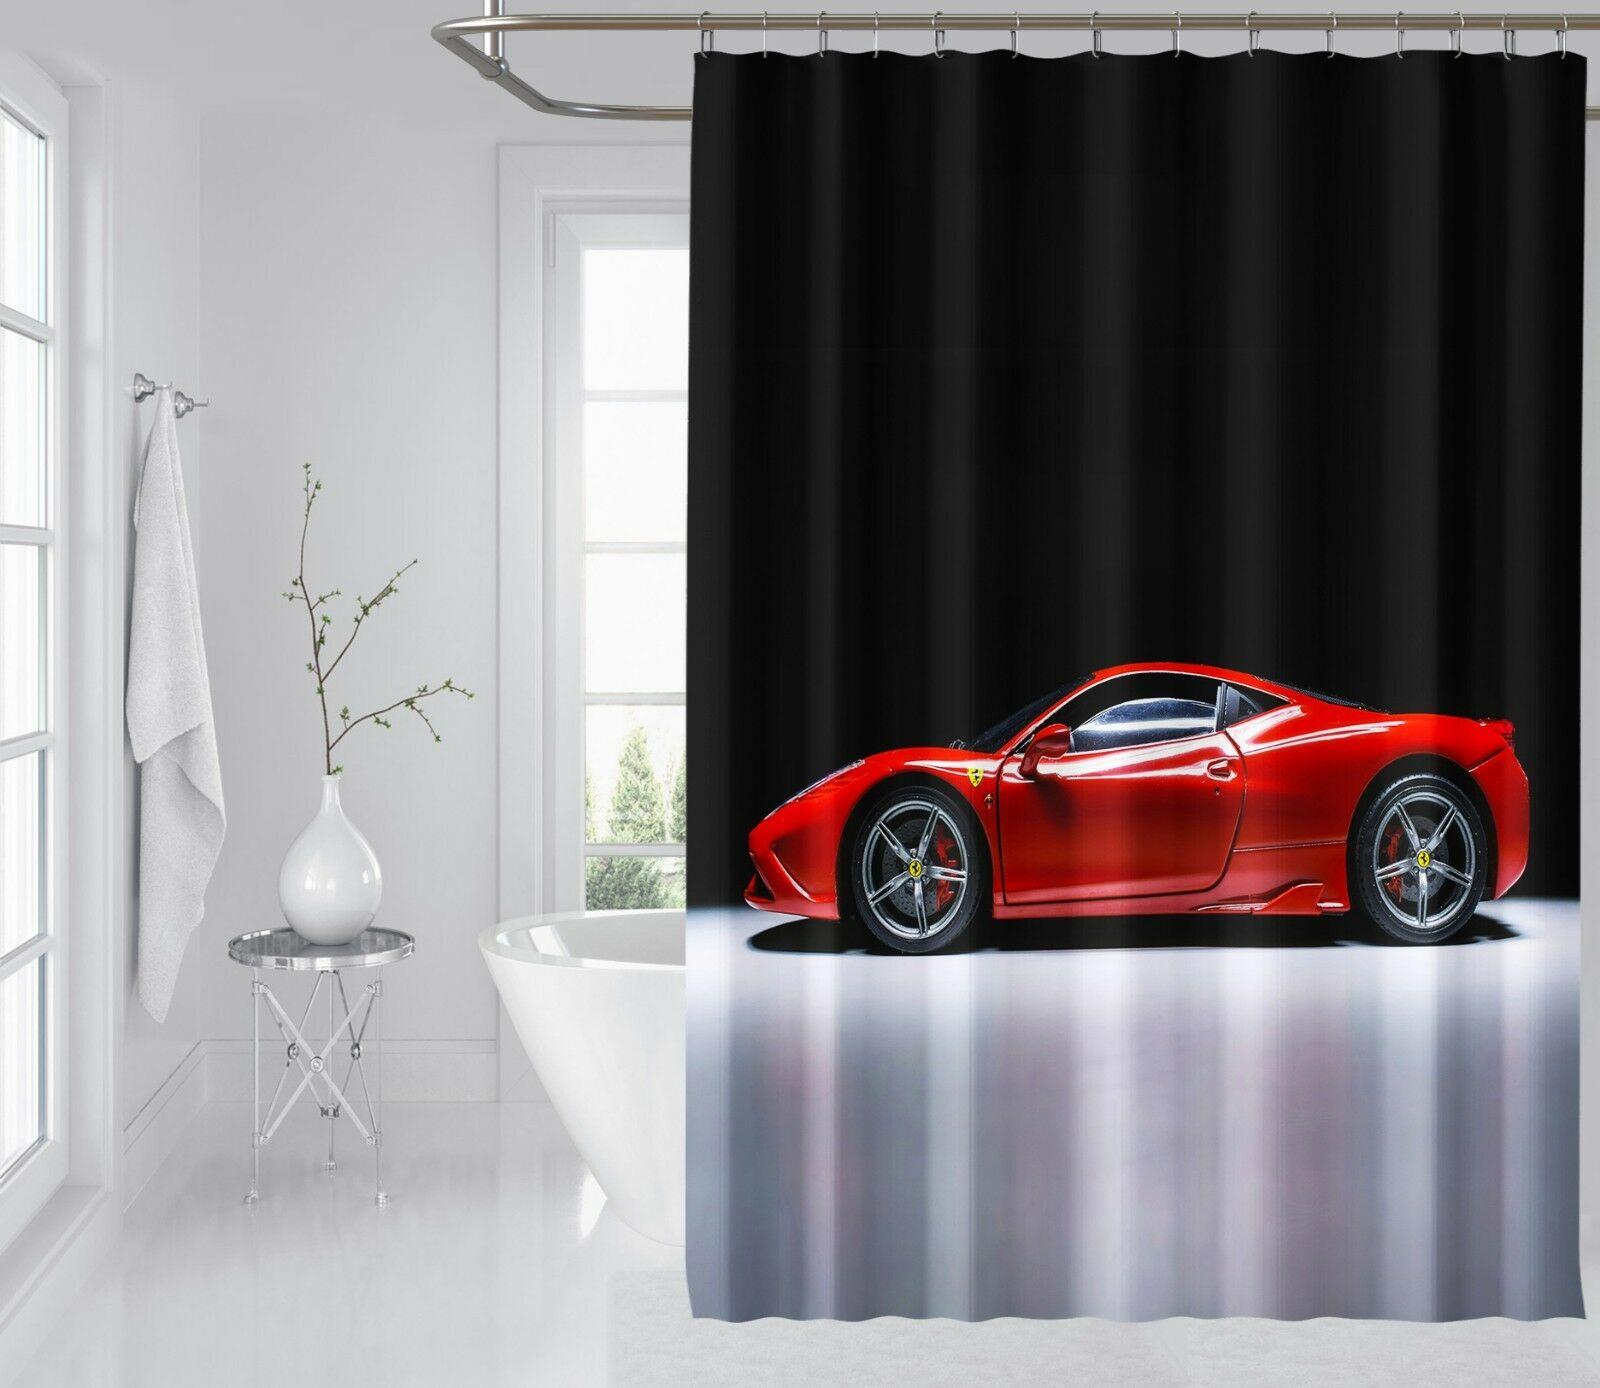 3D rojo deportes coche ducha cortina impermeable fibra baño ventanas inodoro